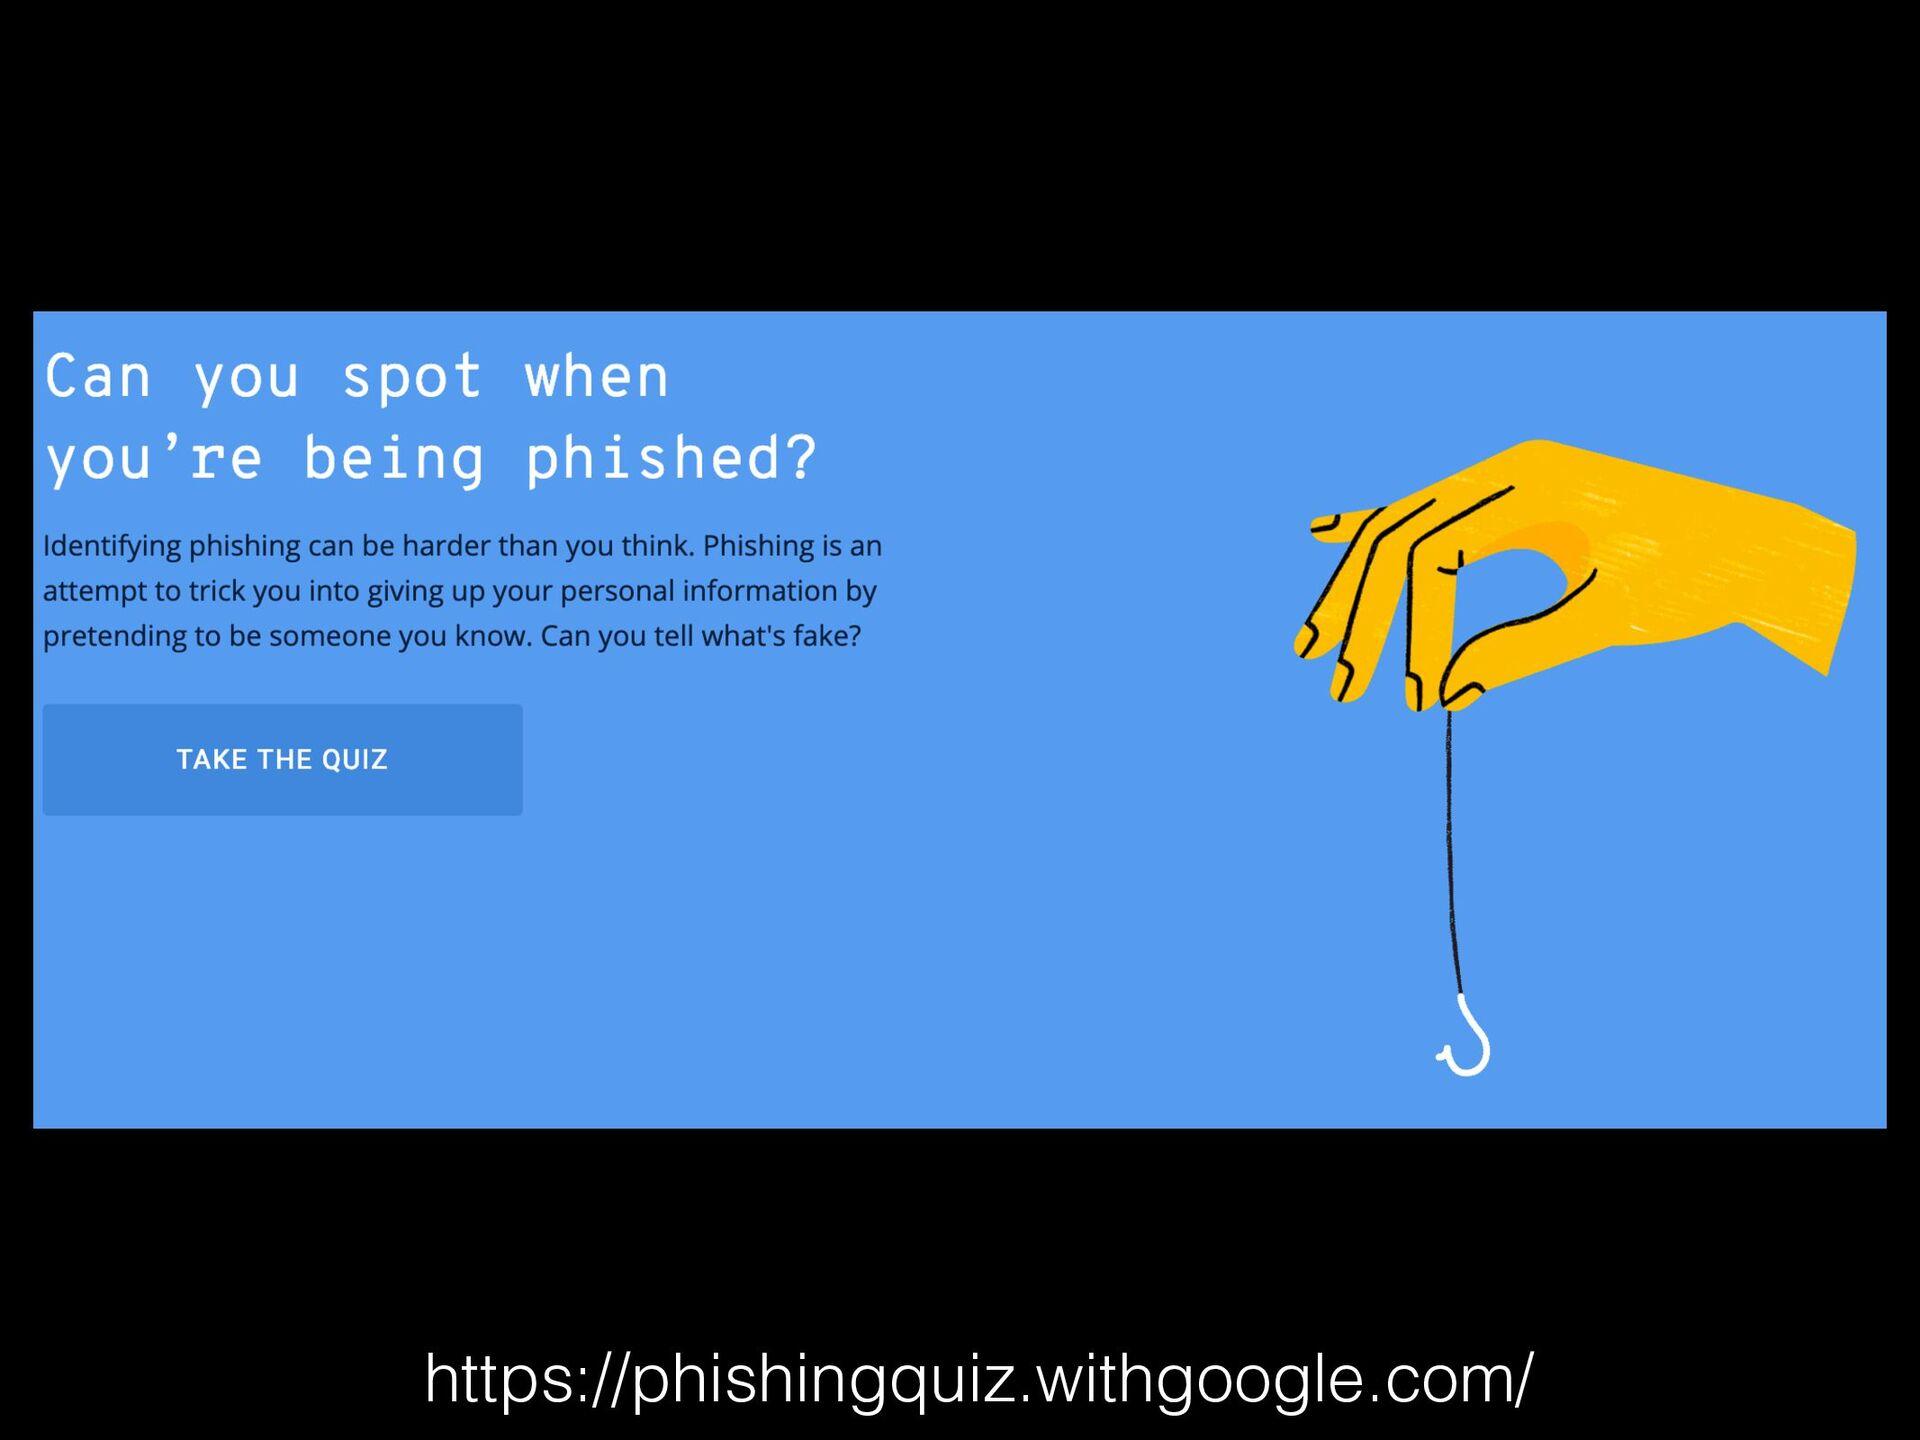 https://phishingquiz.withgoogle.com/